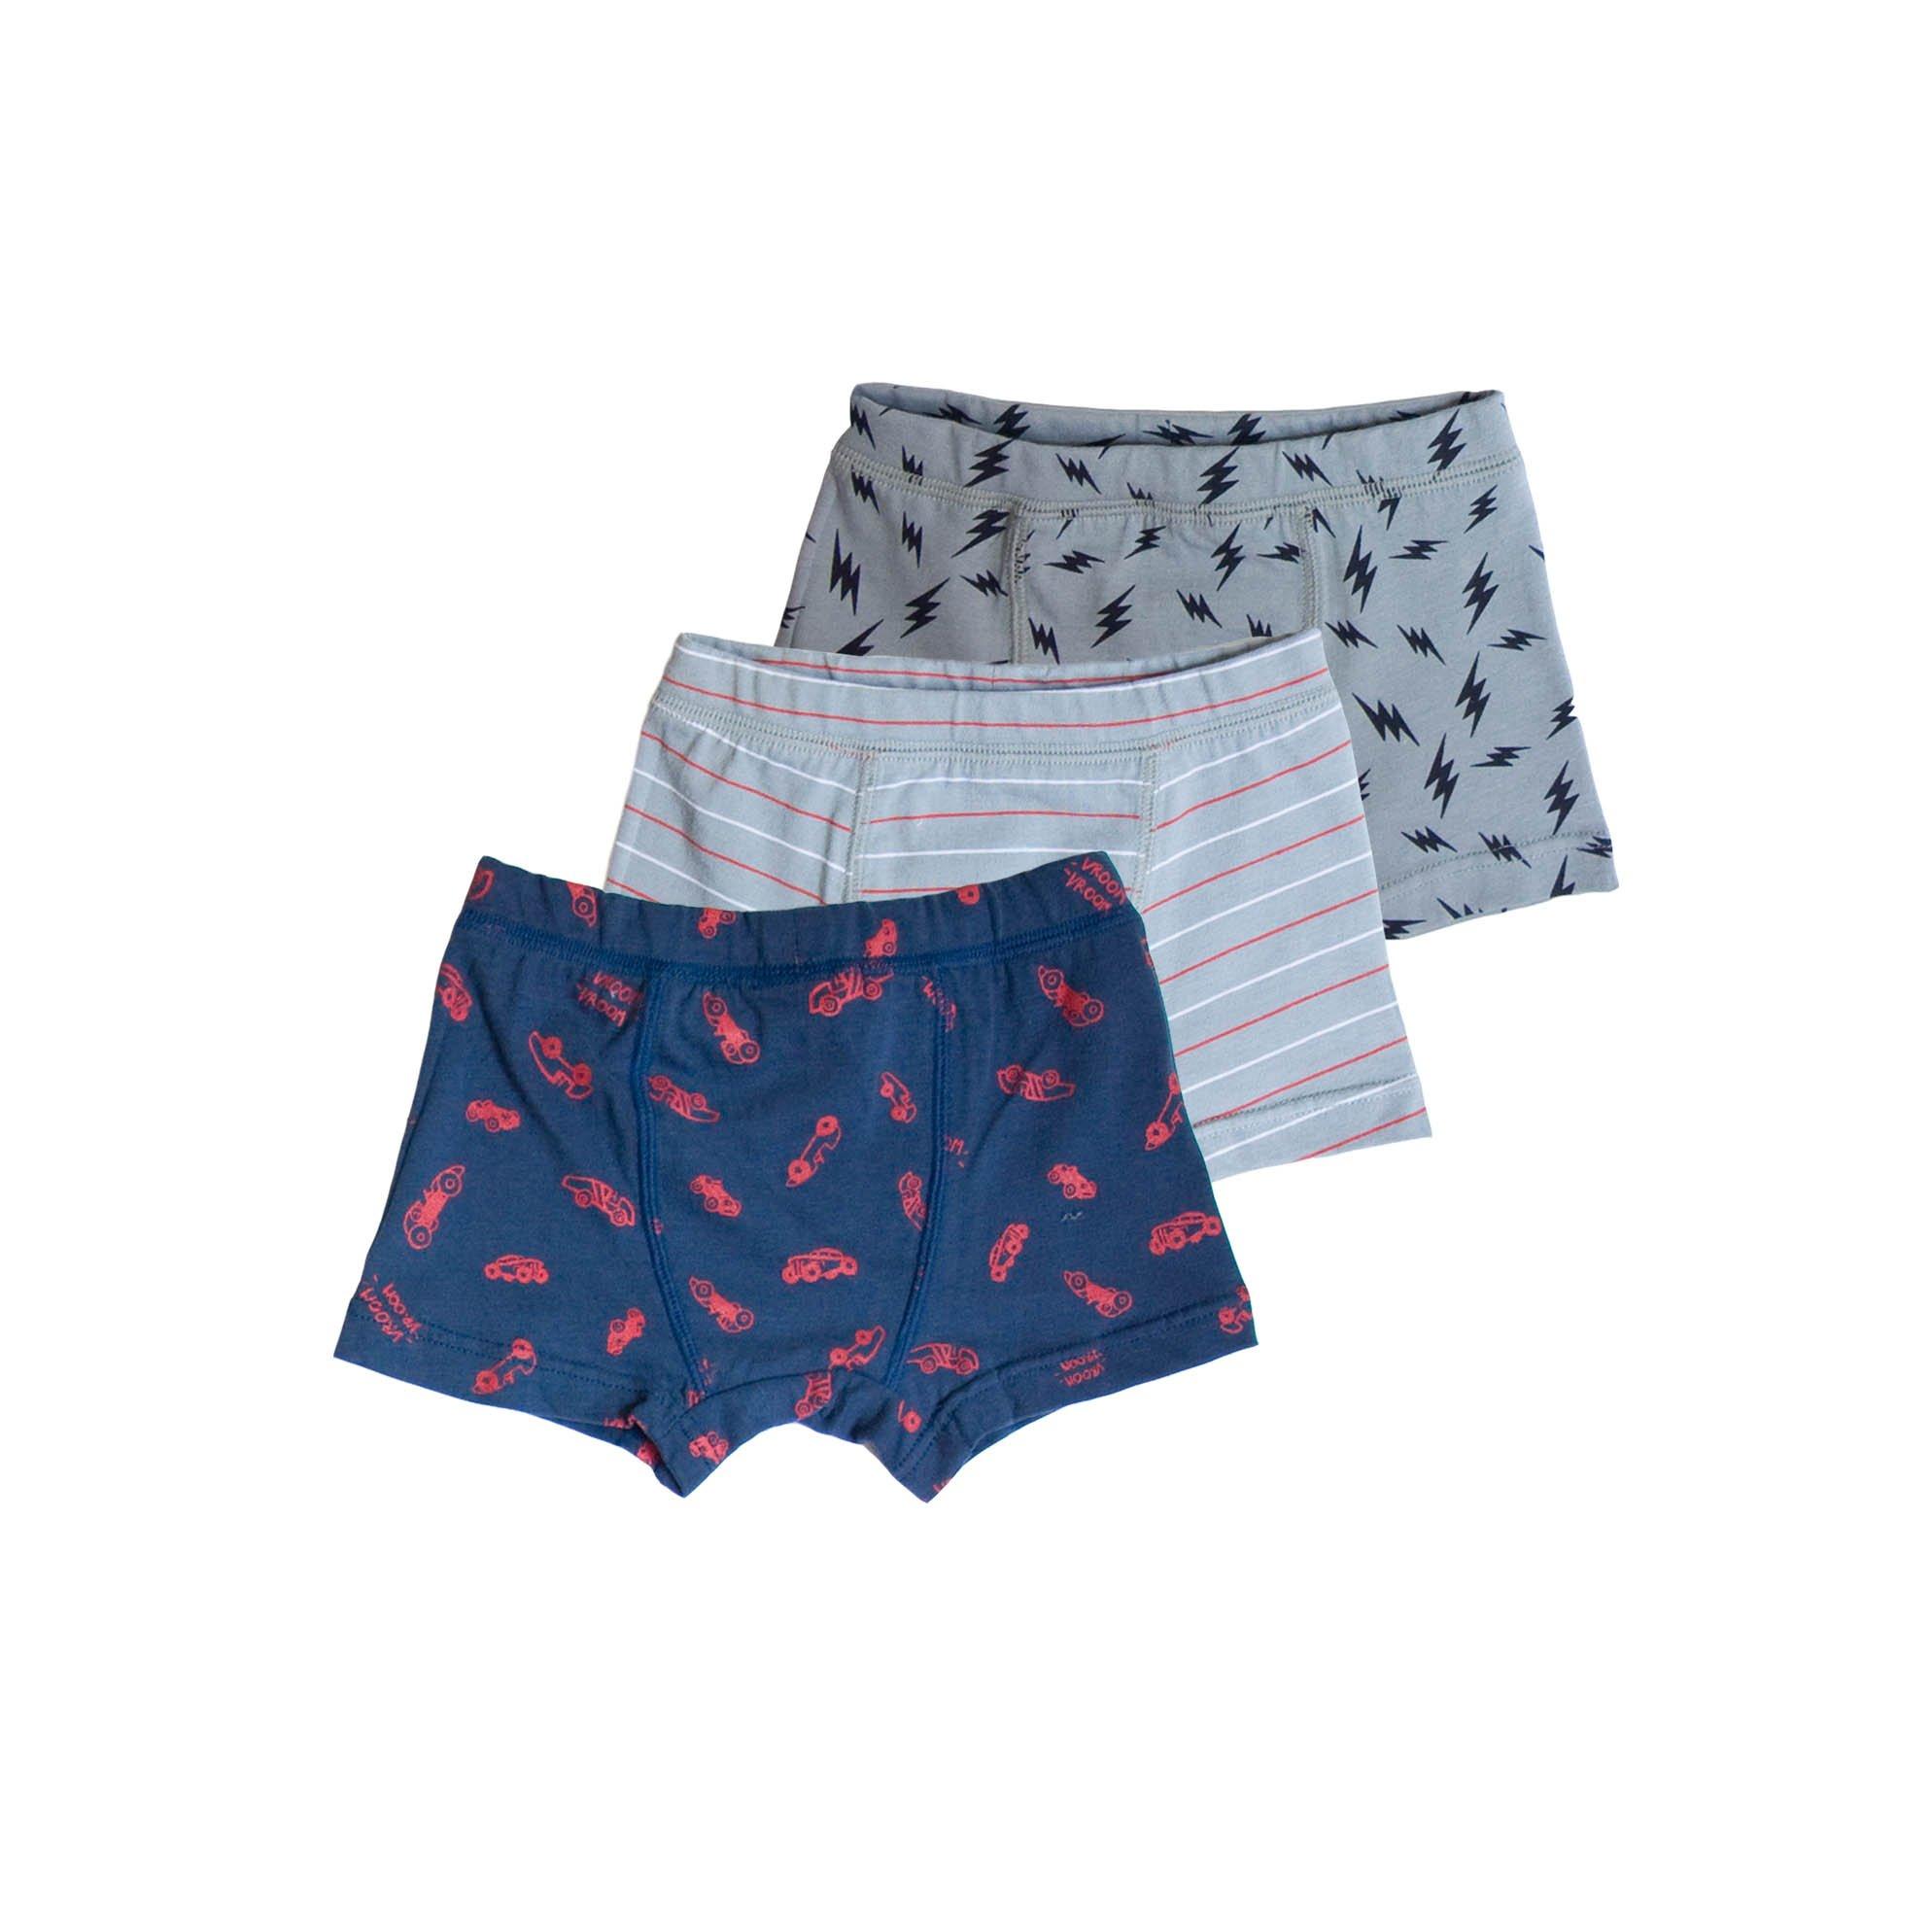 Skylar Luna 3 Pc Toddler Boxer Brief Set- Speed Print Toddler Size 4